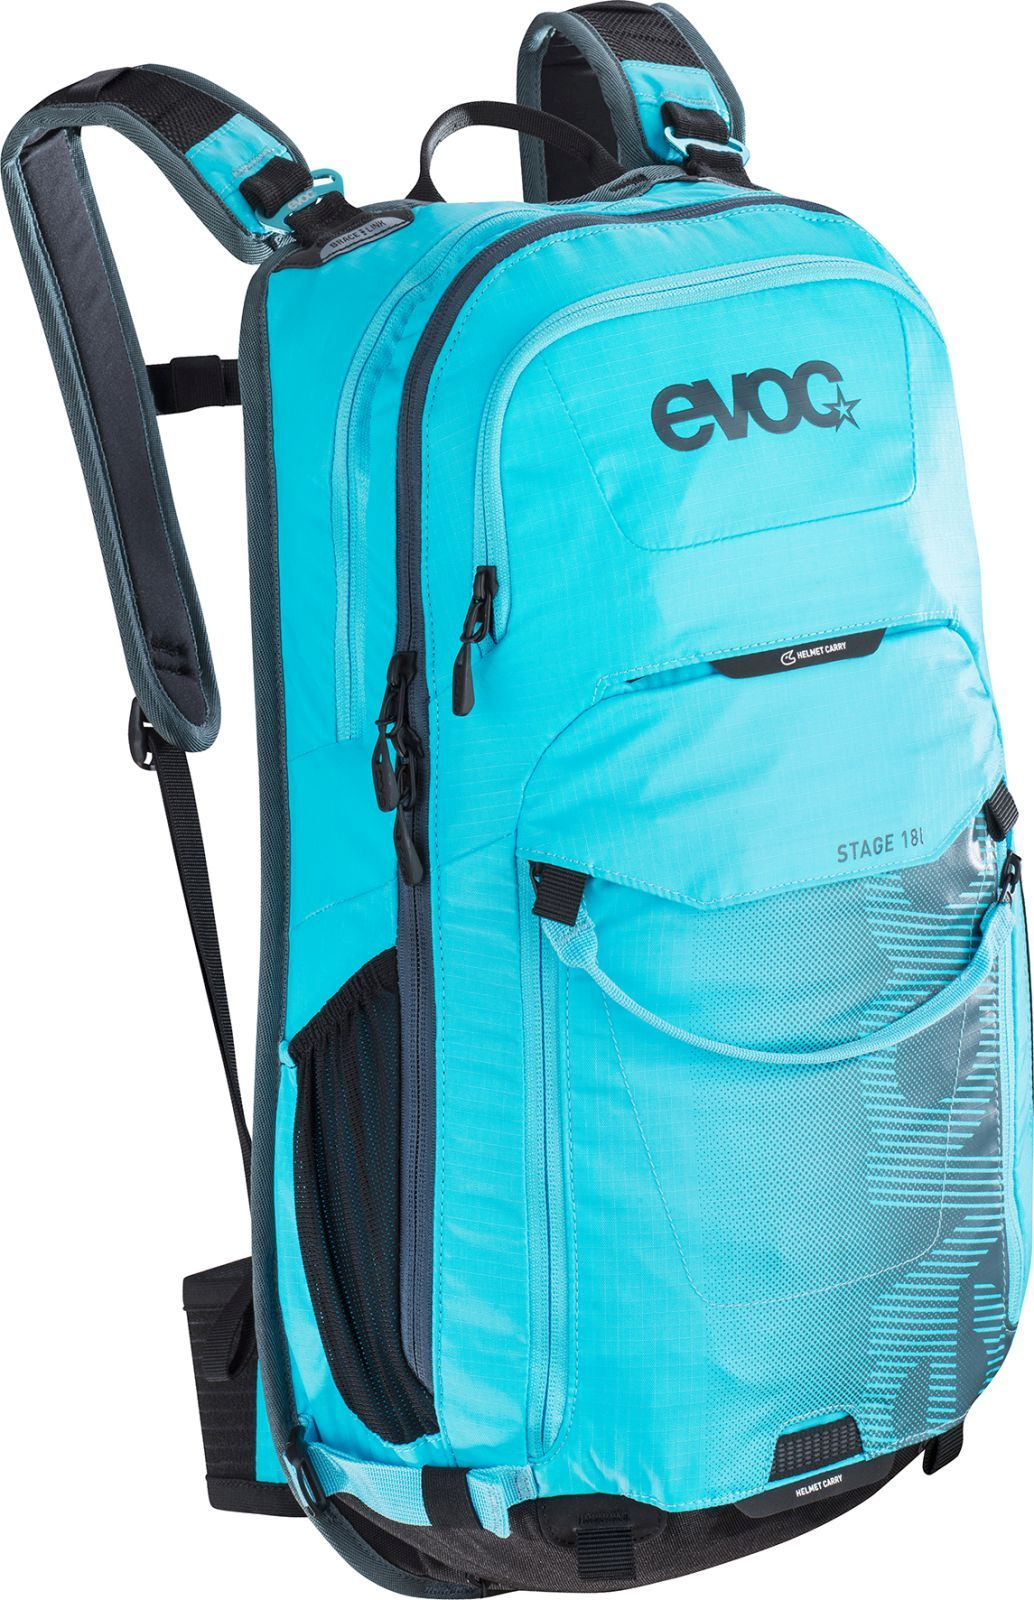 3f03dd8d13 Cyklistický batoh Evoc Stage 18L - neon blue - Spot Shop